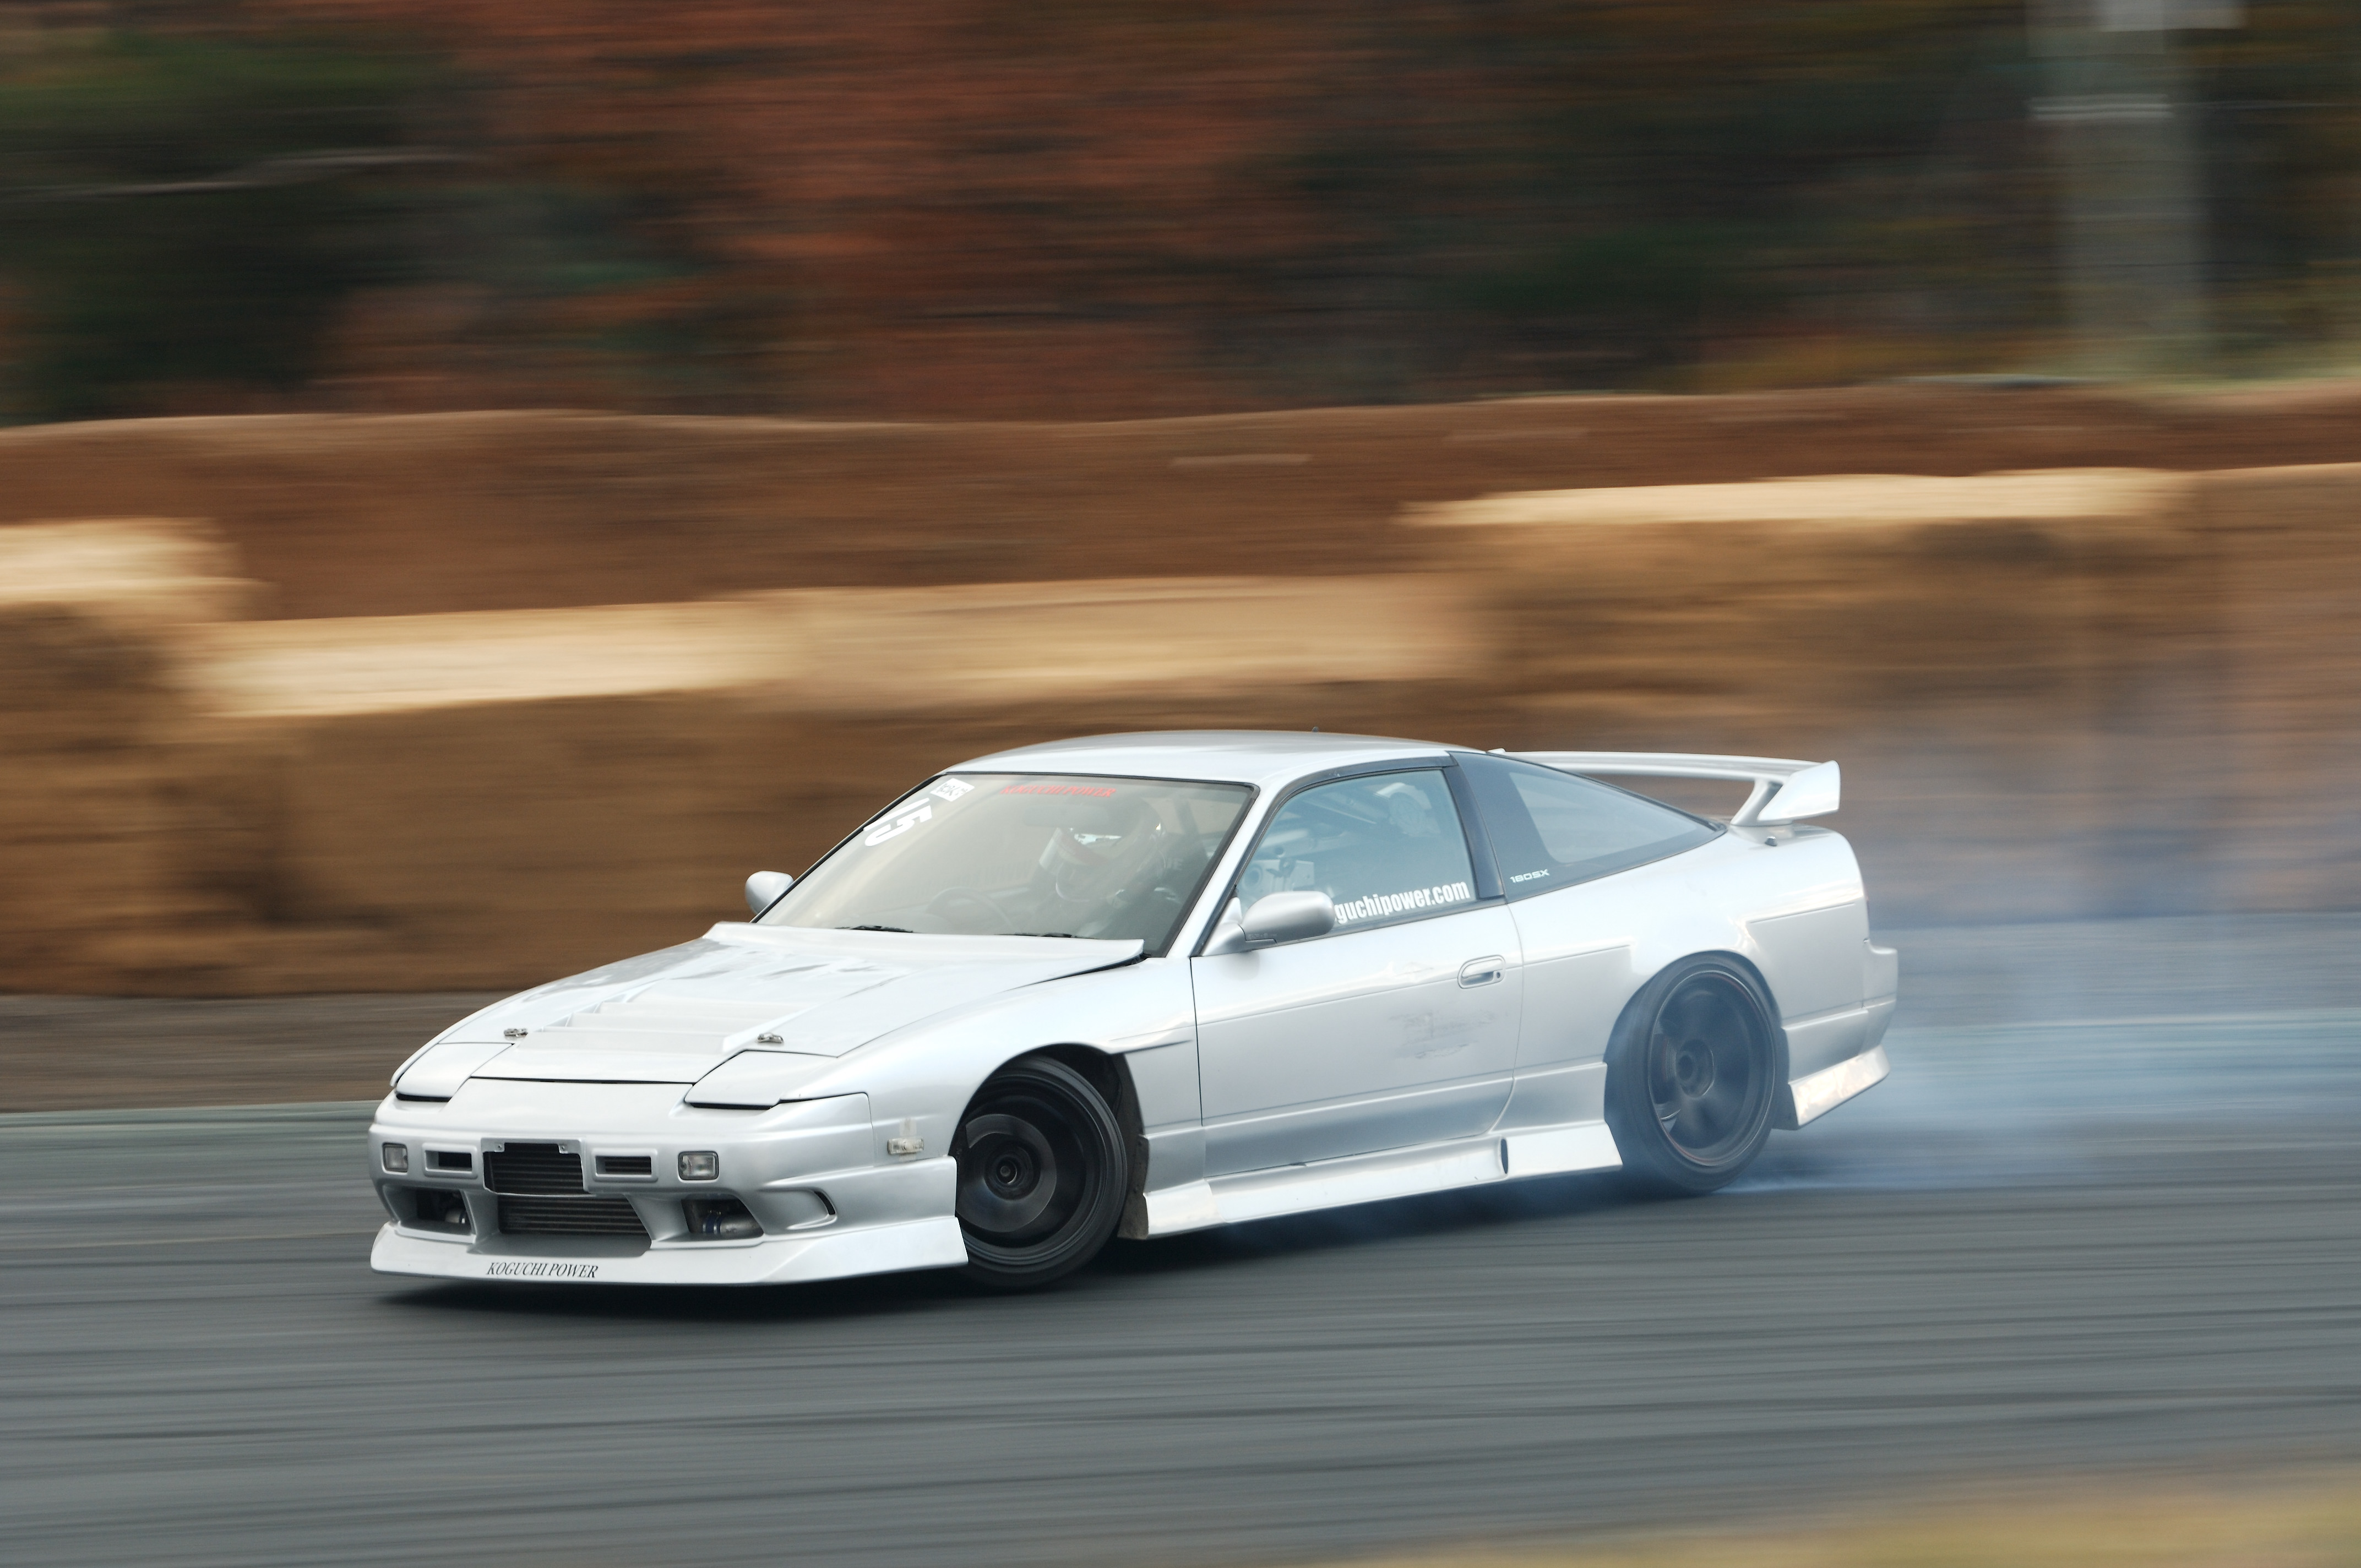 Nissan Of Hawthorne >> J-縁故: High–Res Picture of Koguchi Girlfriend's 180SX